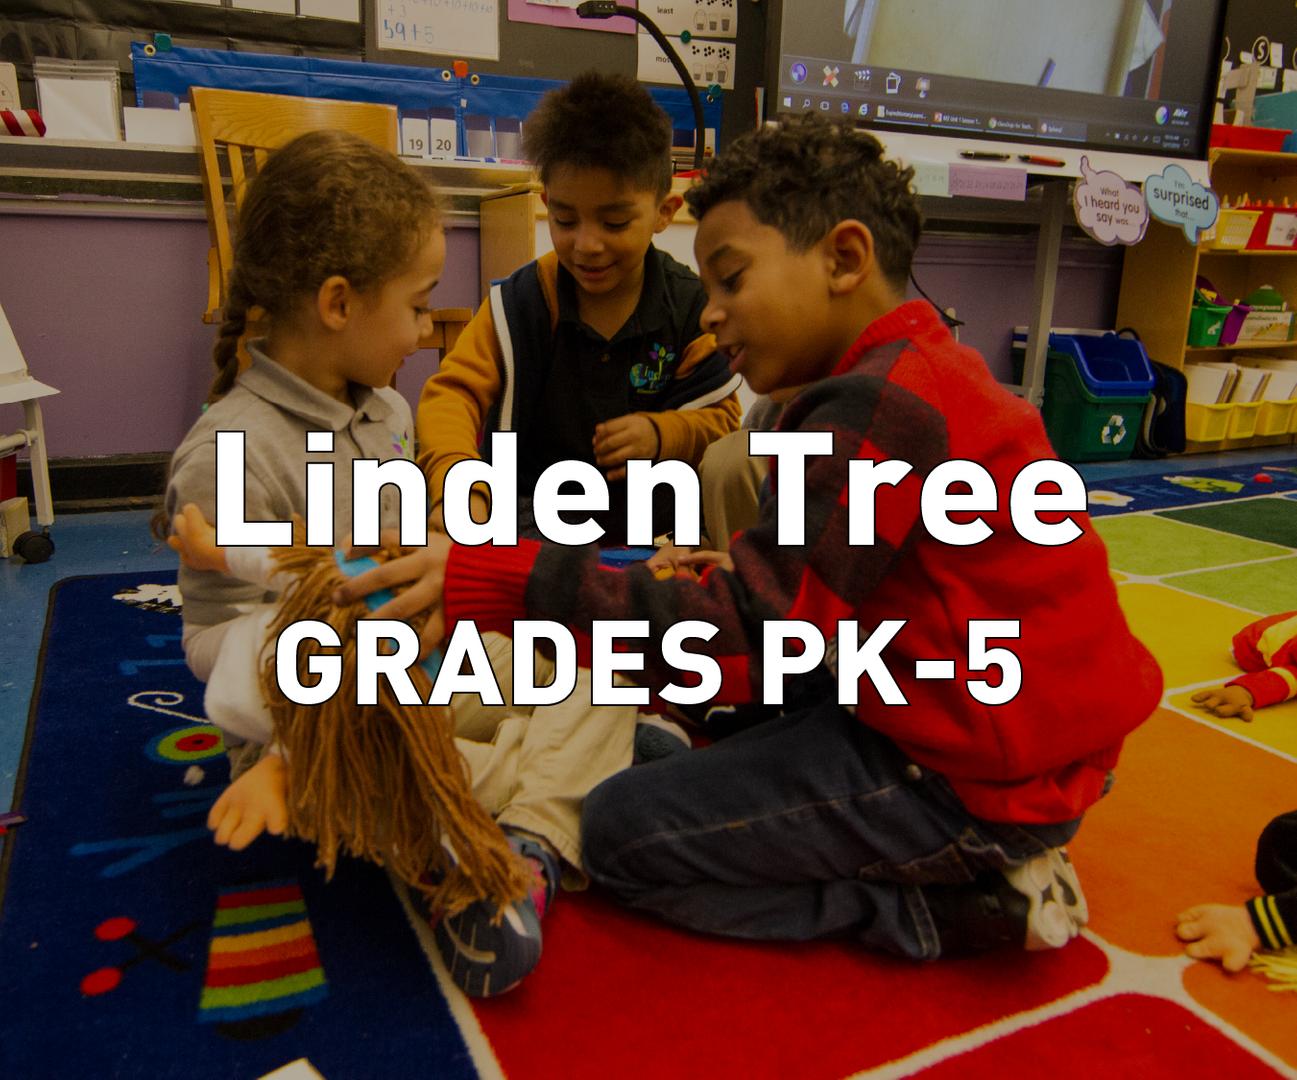 Linden Tree Grades PK-5